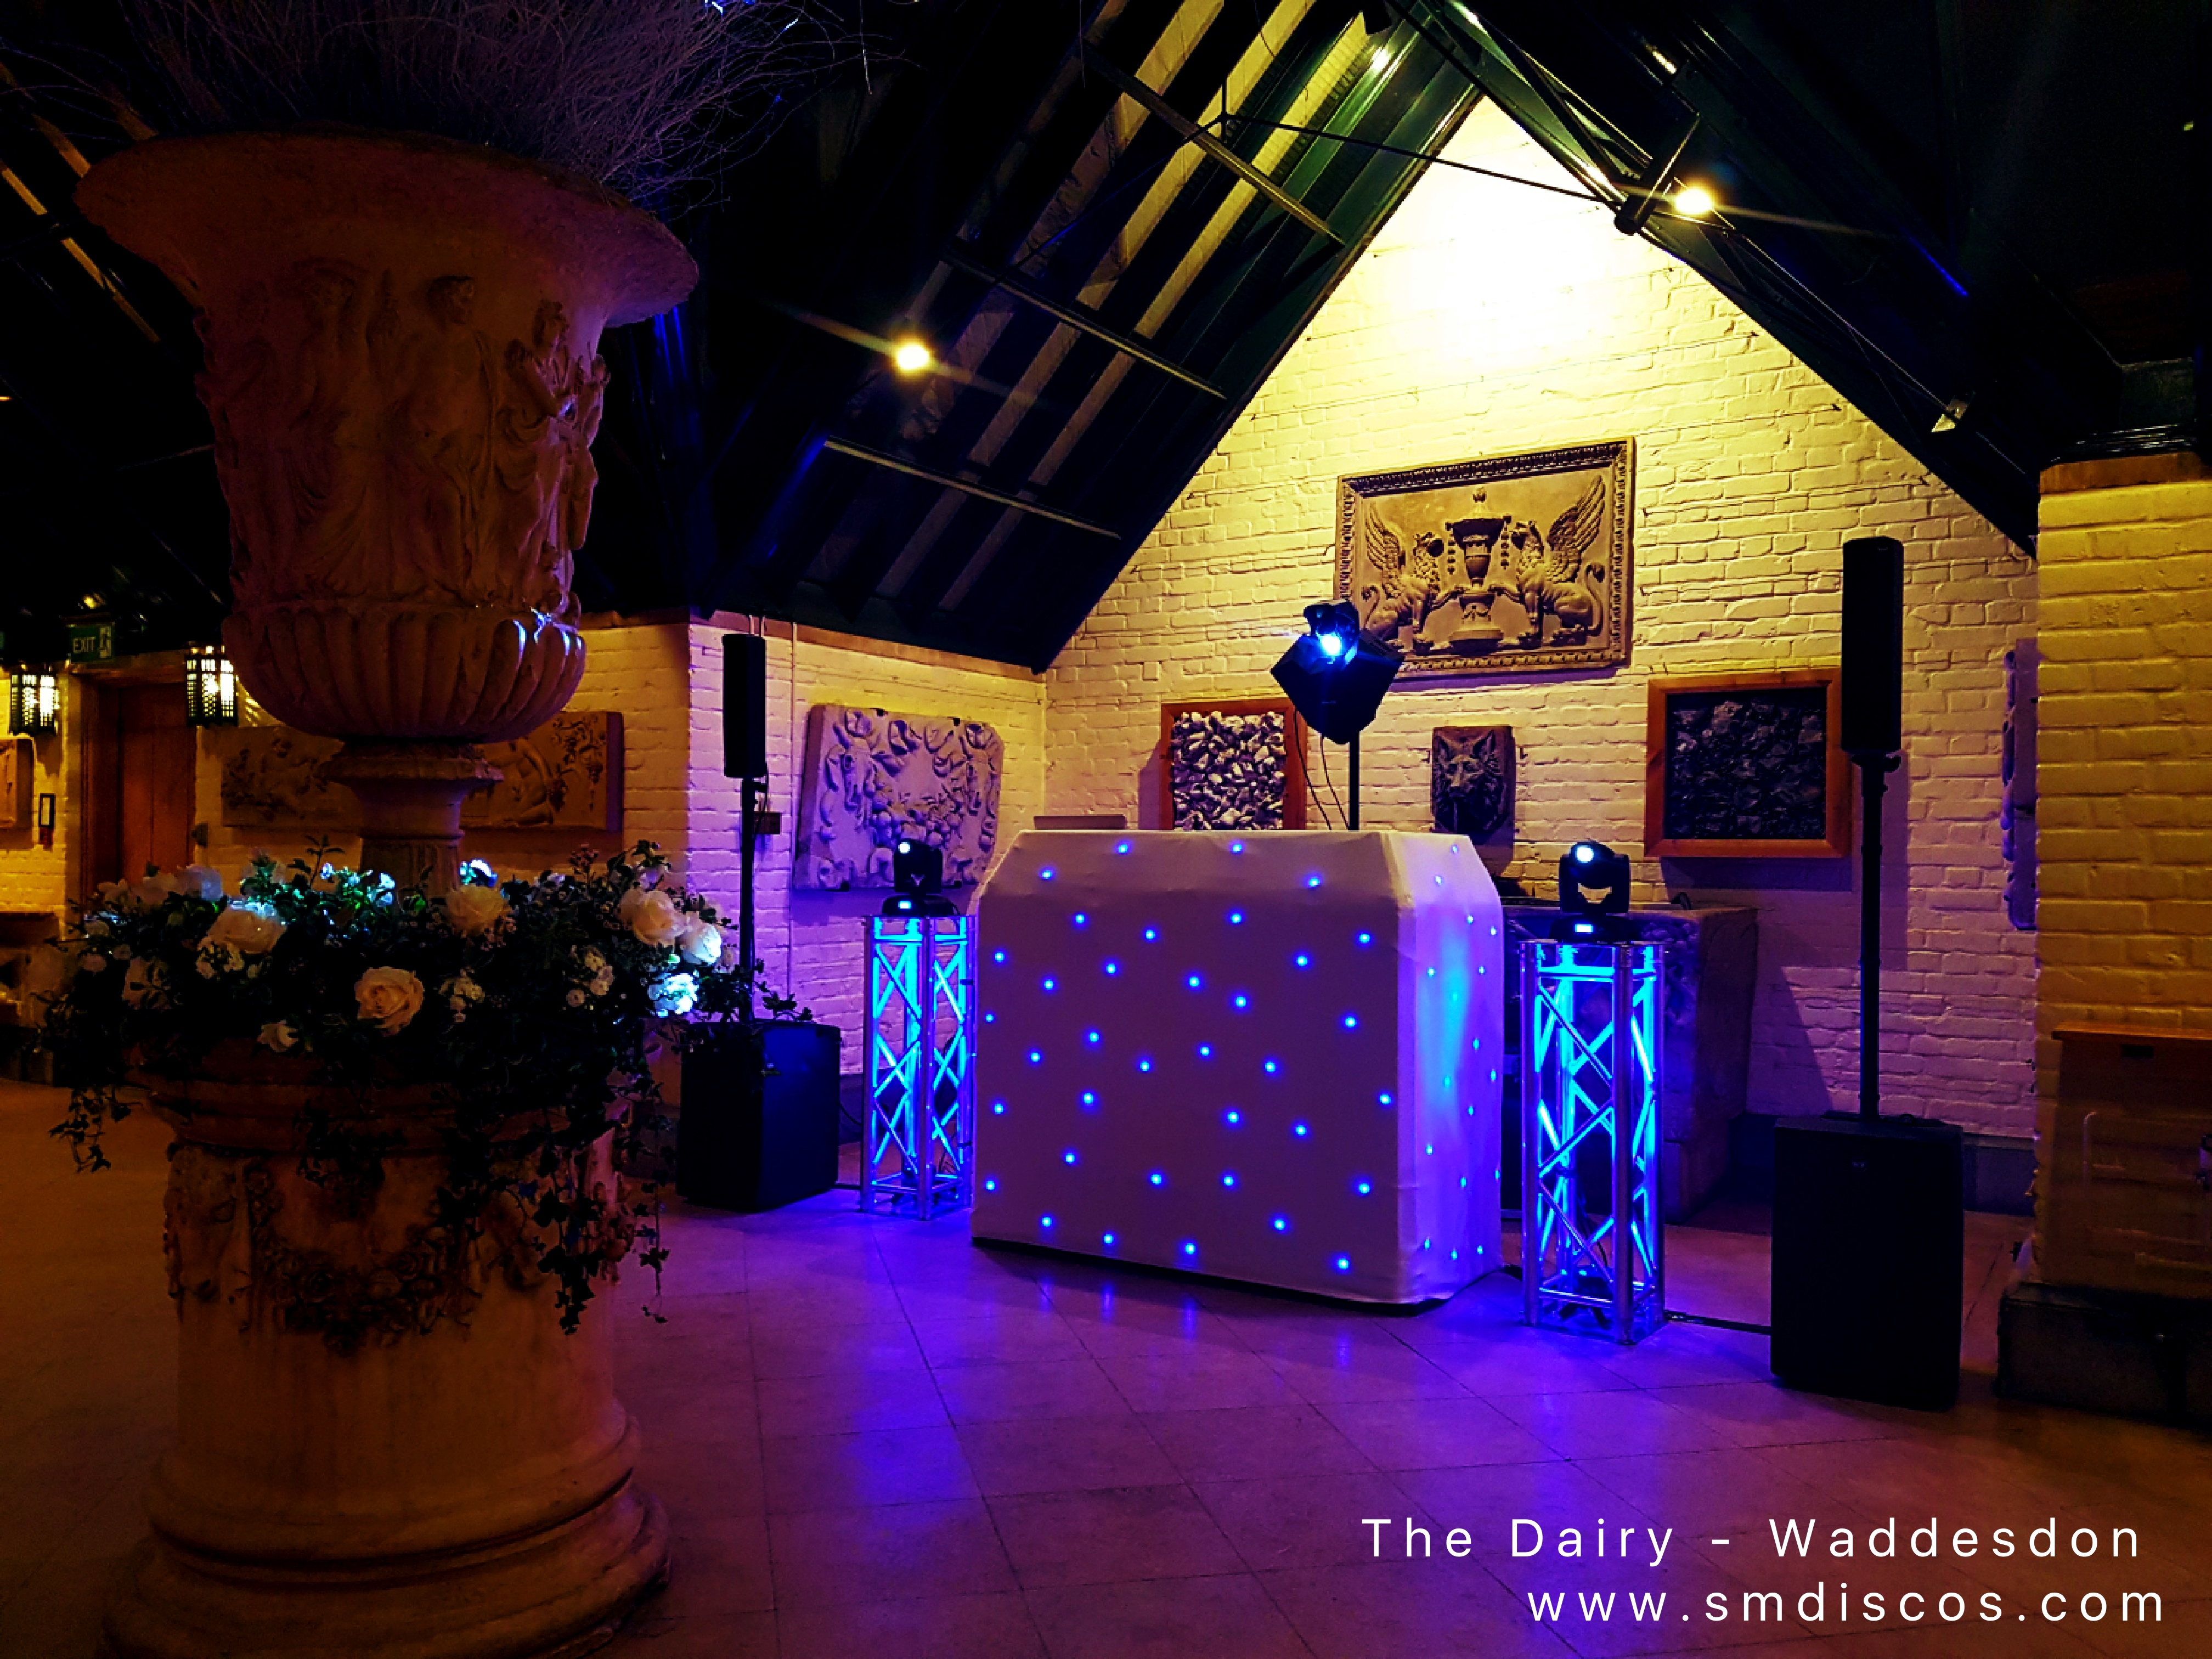 The Dairy - Waddesdon Wedding DJ